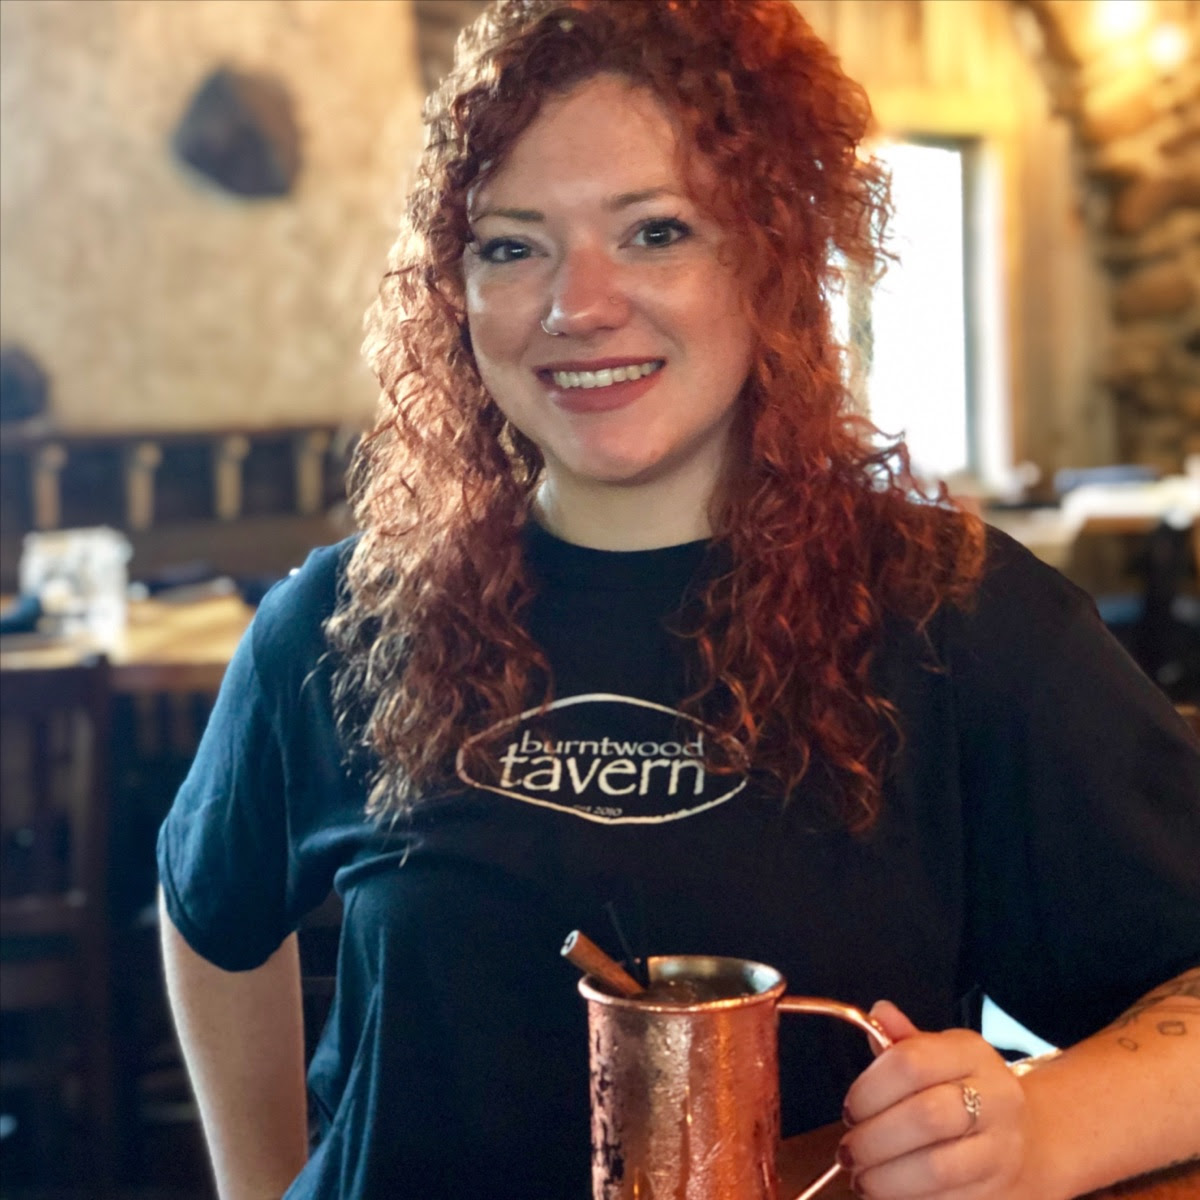 Cinnamule made with crown apple, cider & ginger beer.